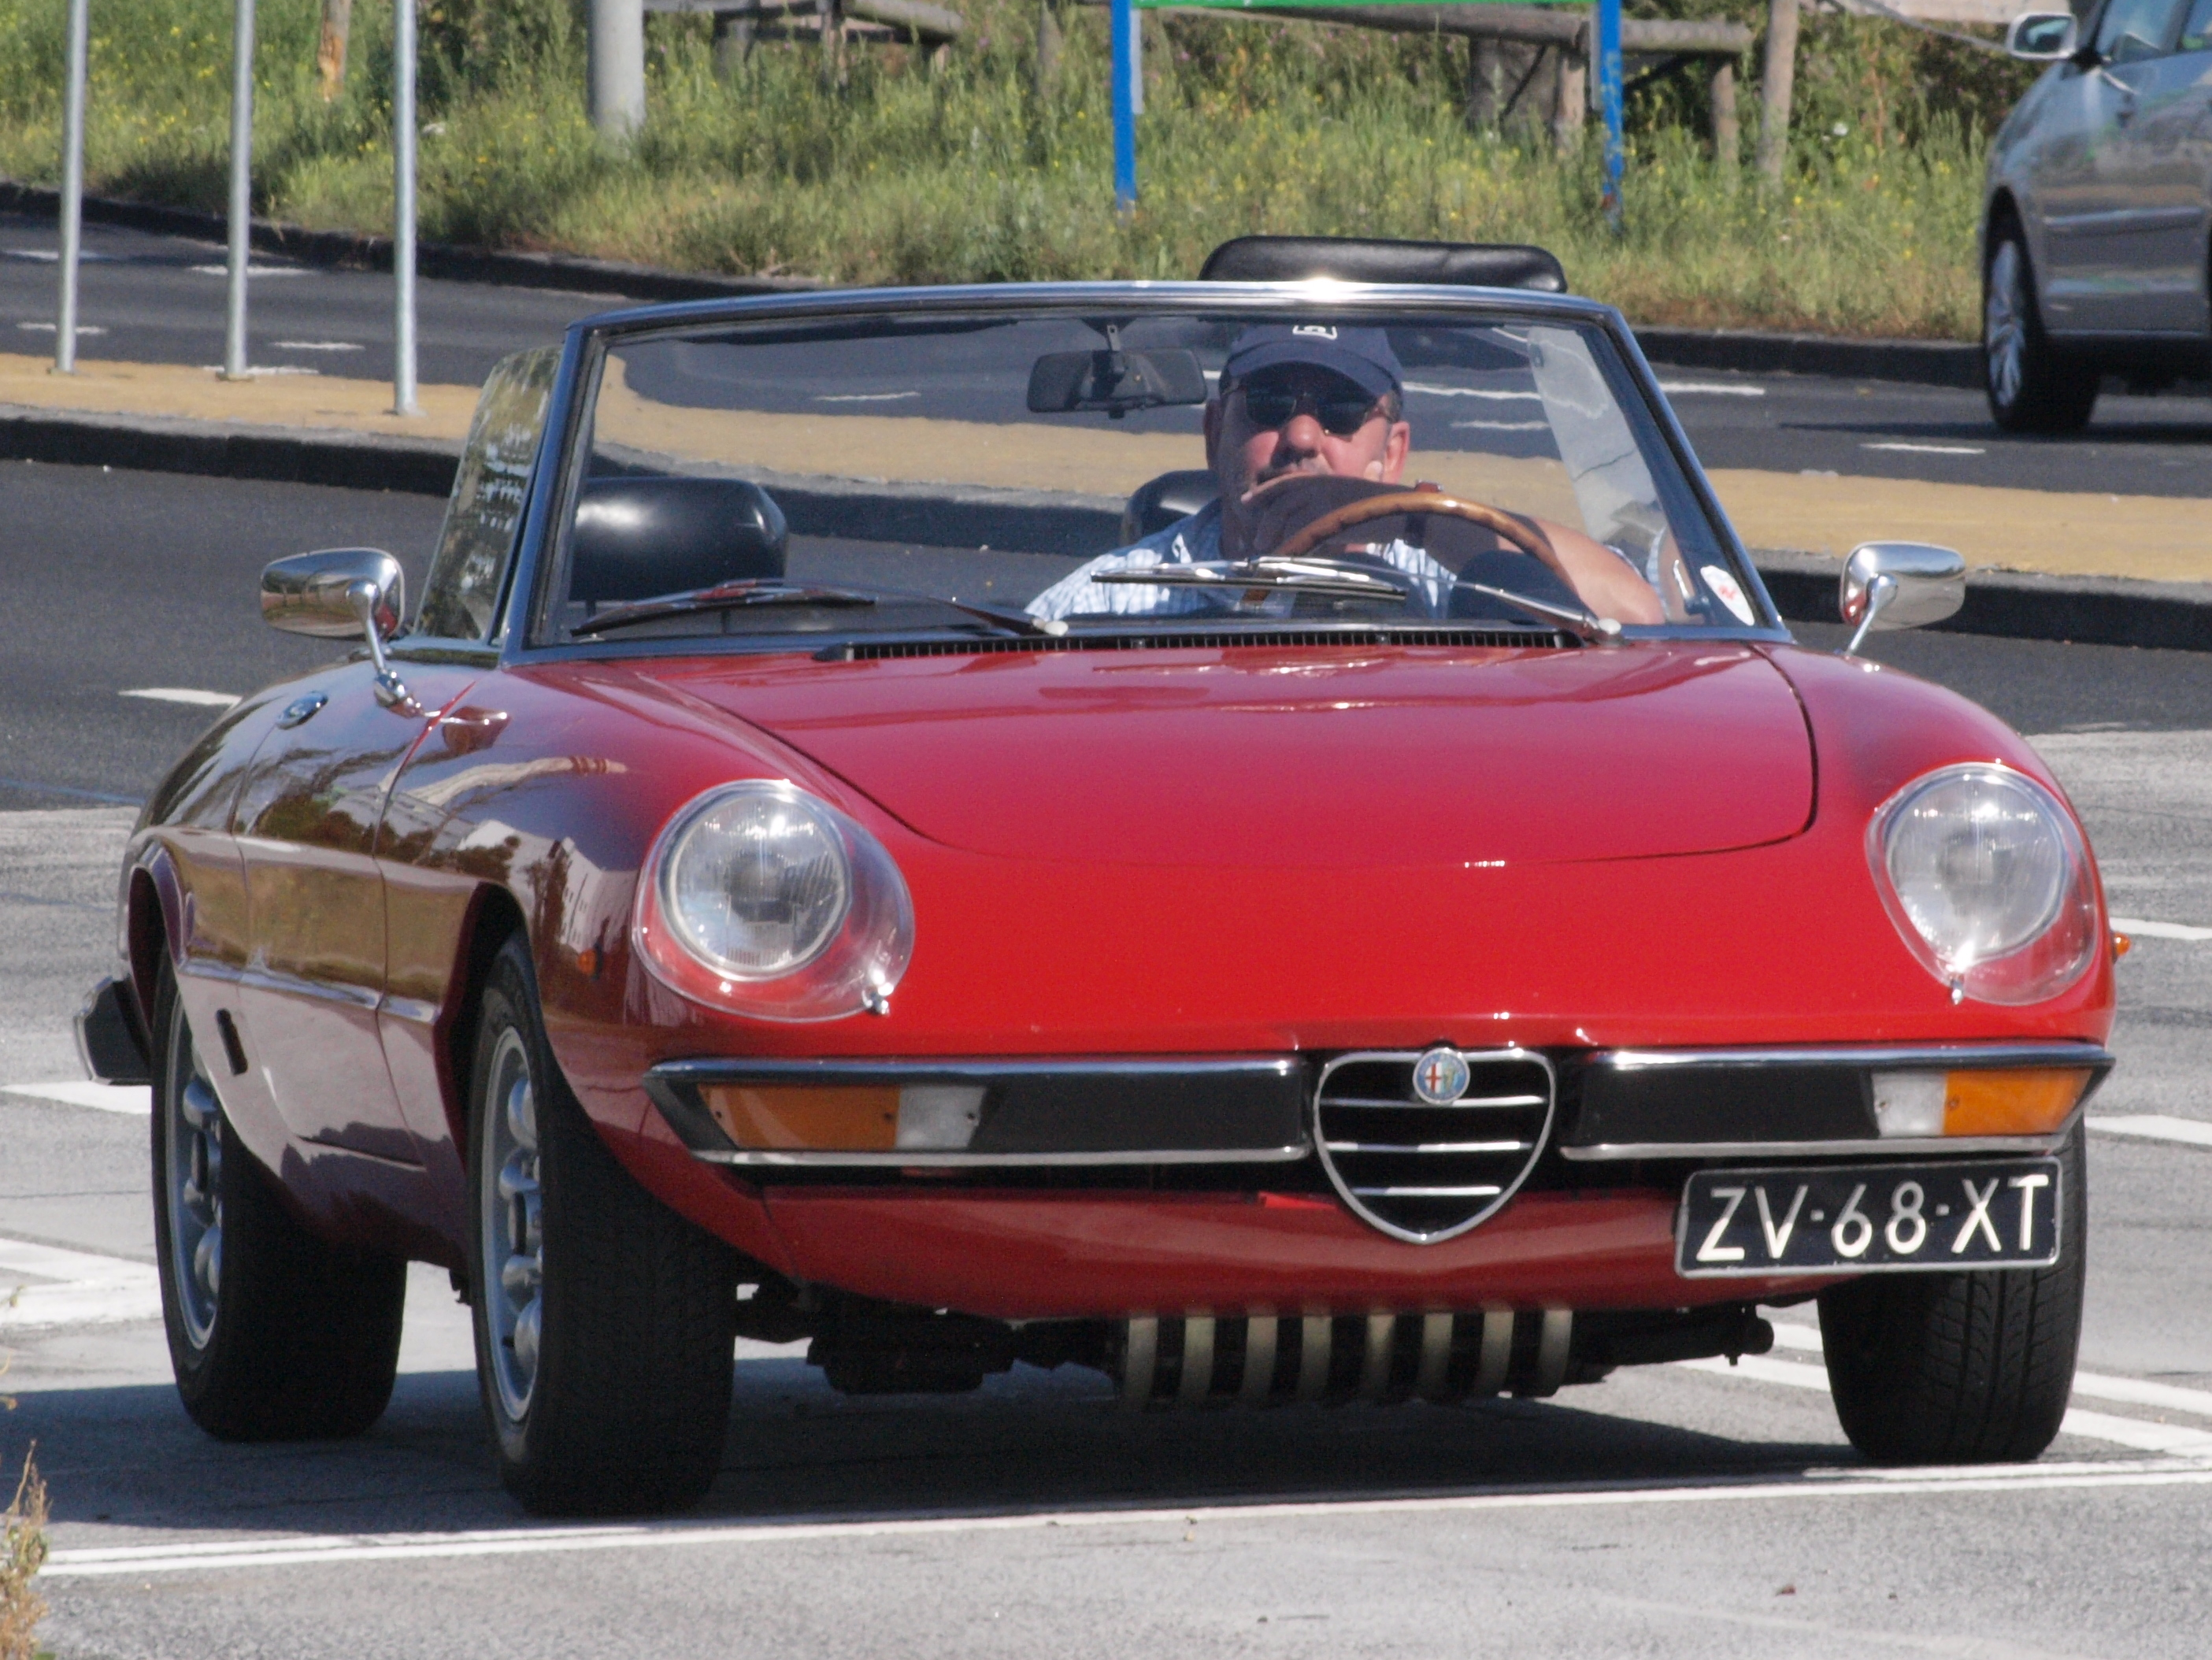 Alfa_Romeo_2000_Spider_Veloce_ZV-68-XT_pic1.jpg